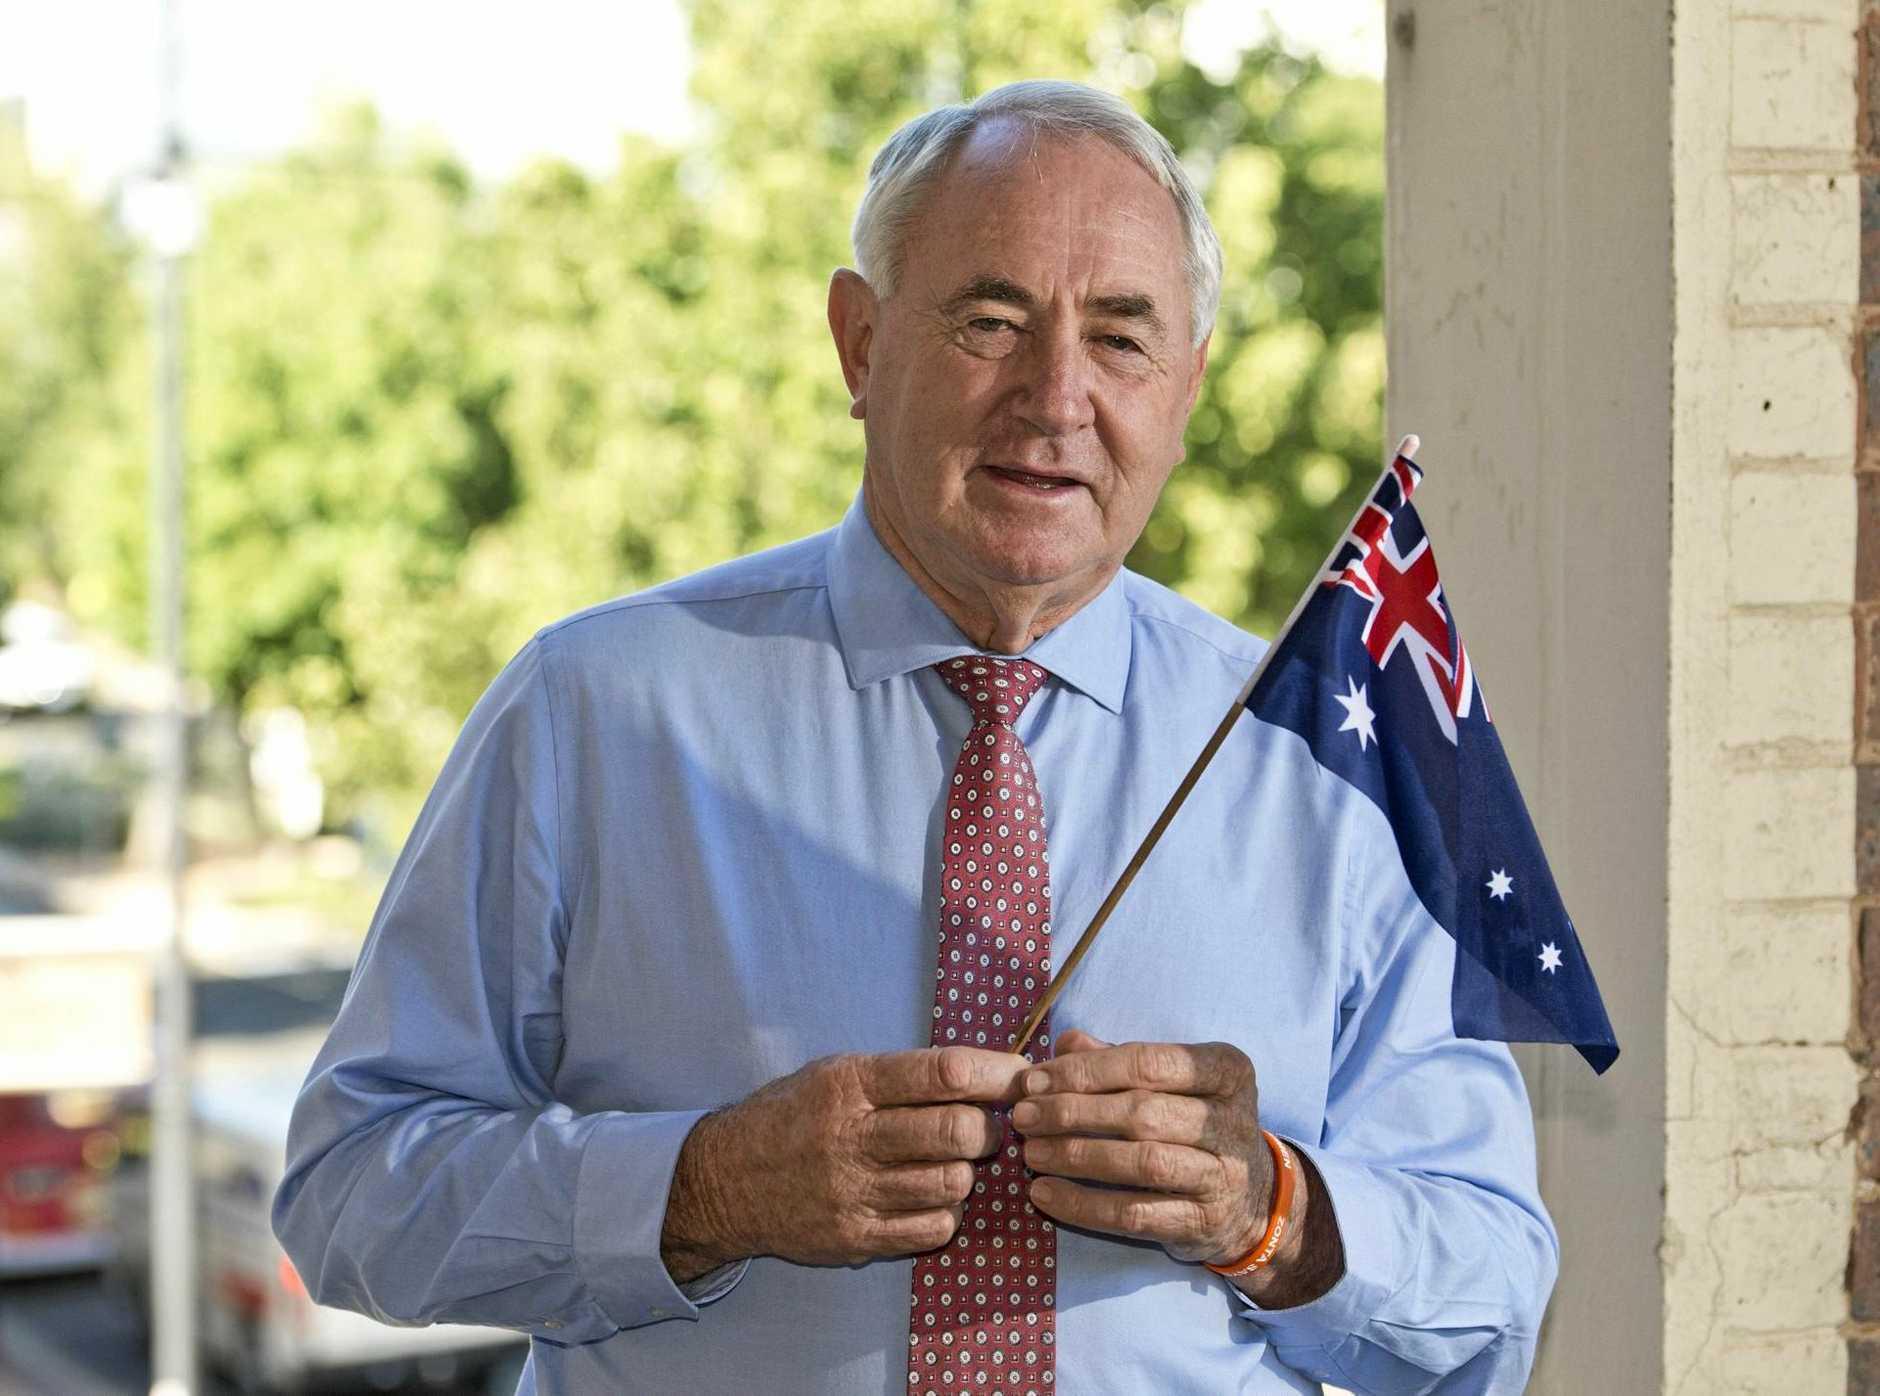 Toowoomba Regional Council Mayor Paul Antonio talks about Australia Day, Monday, January 22, 2018.